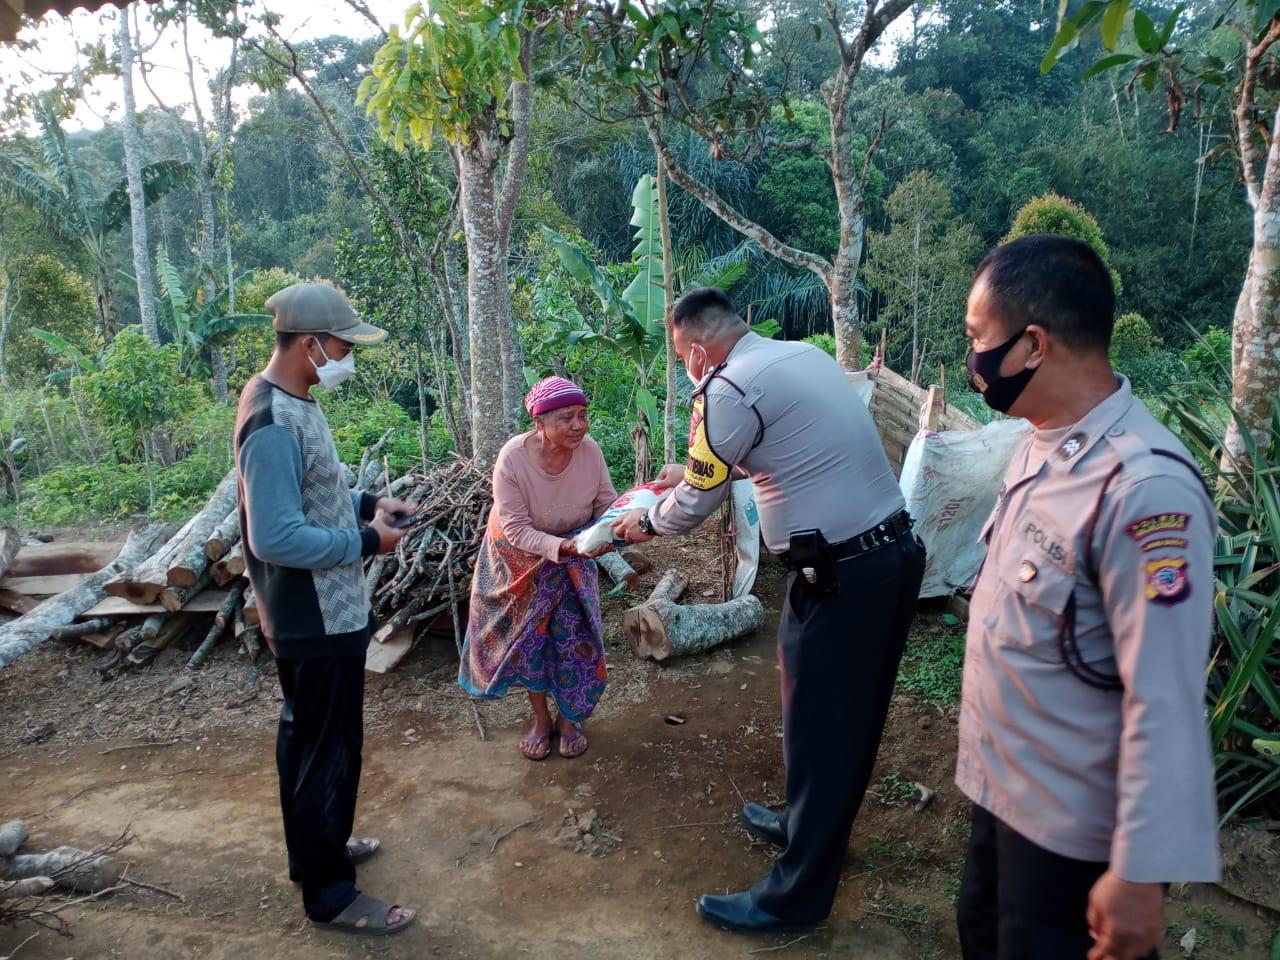 Sambangi Warga Jompo, Kanit Binmas Polsek Argapura Salurkan Bansos Pada Masa PPKM Darurat Level 4